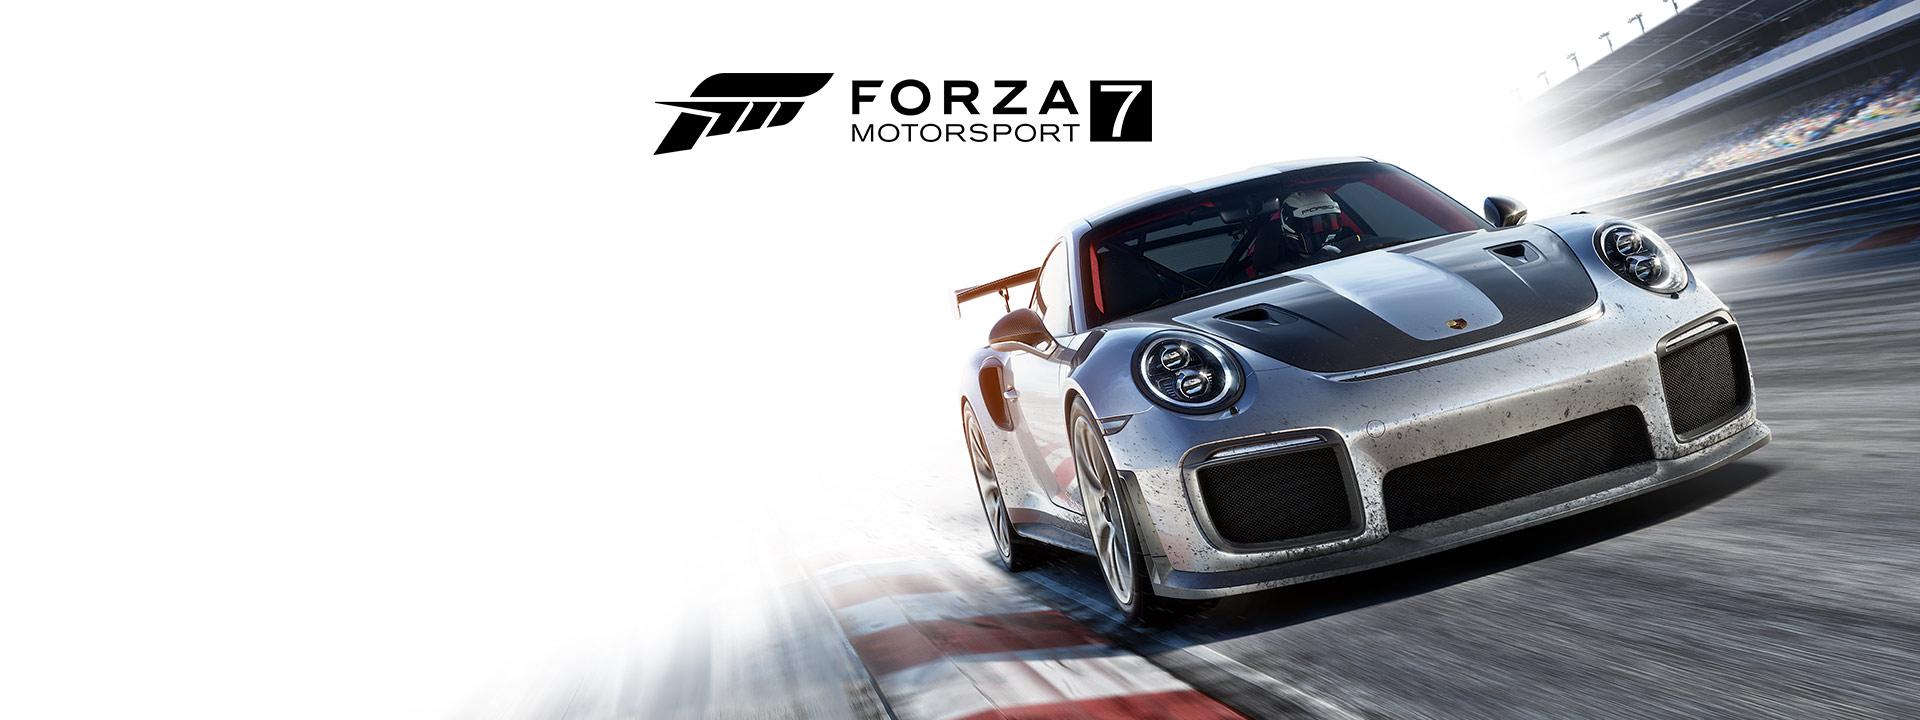 《Forza Motorsport 7》